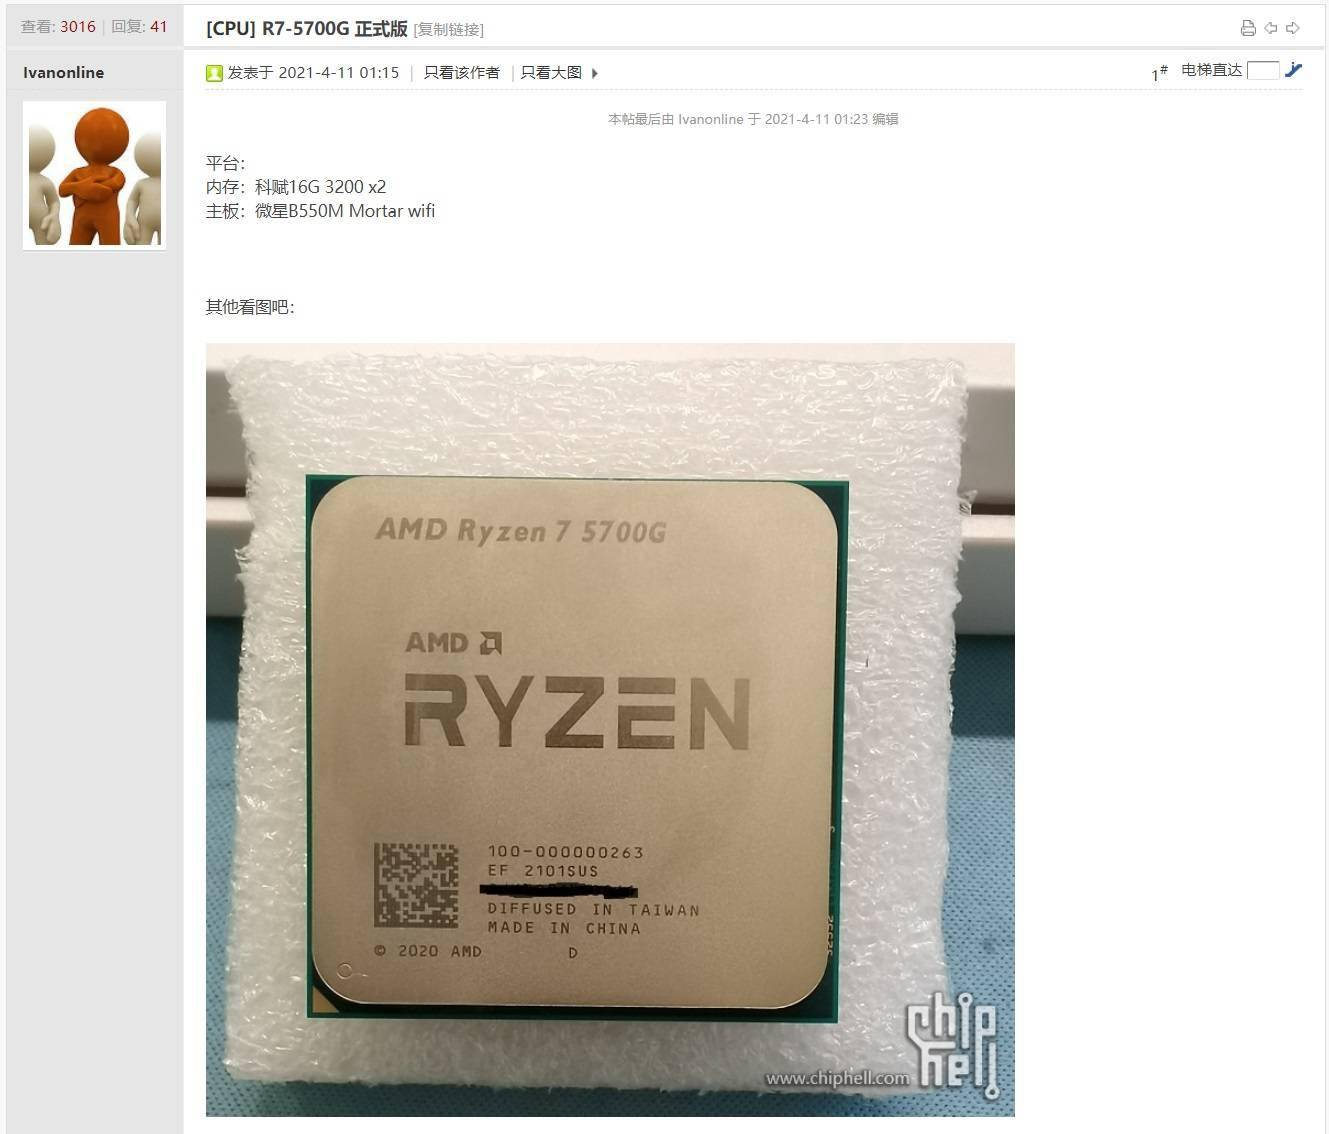 AMD R7 5700G 正式版处理器曝光:Vega 8 核显,单核最高 4.65GHz